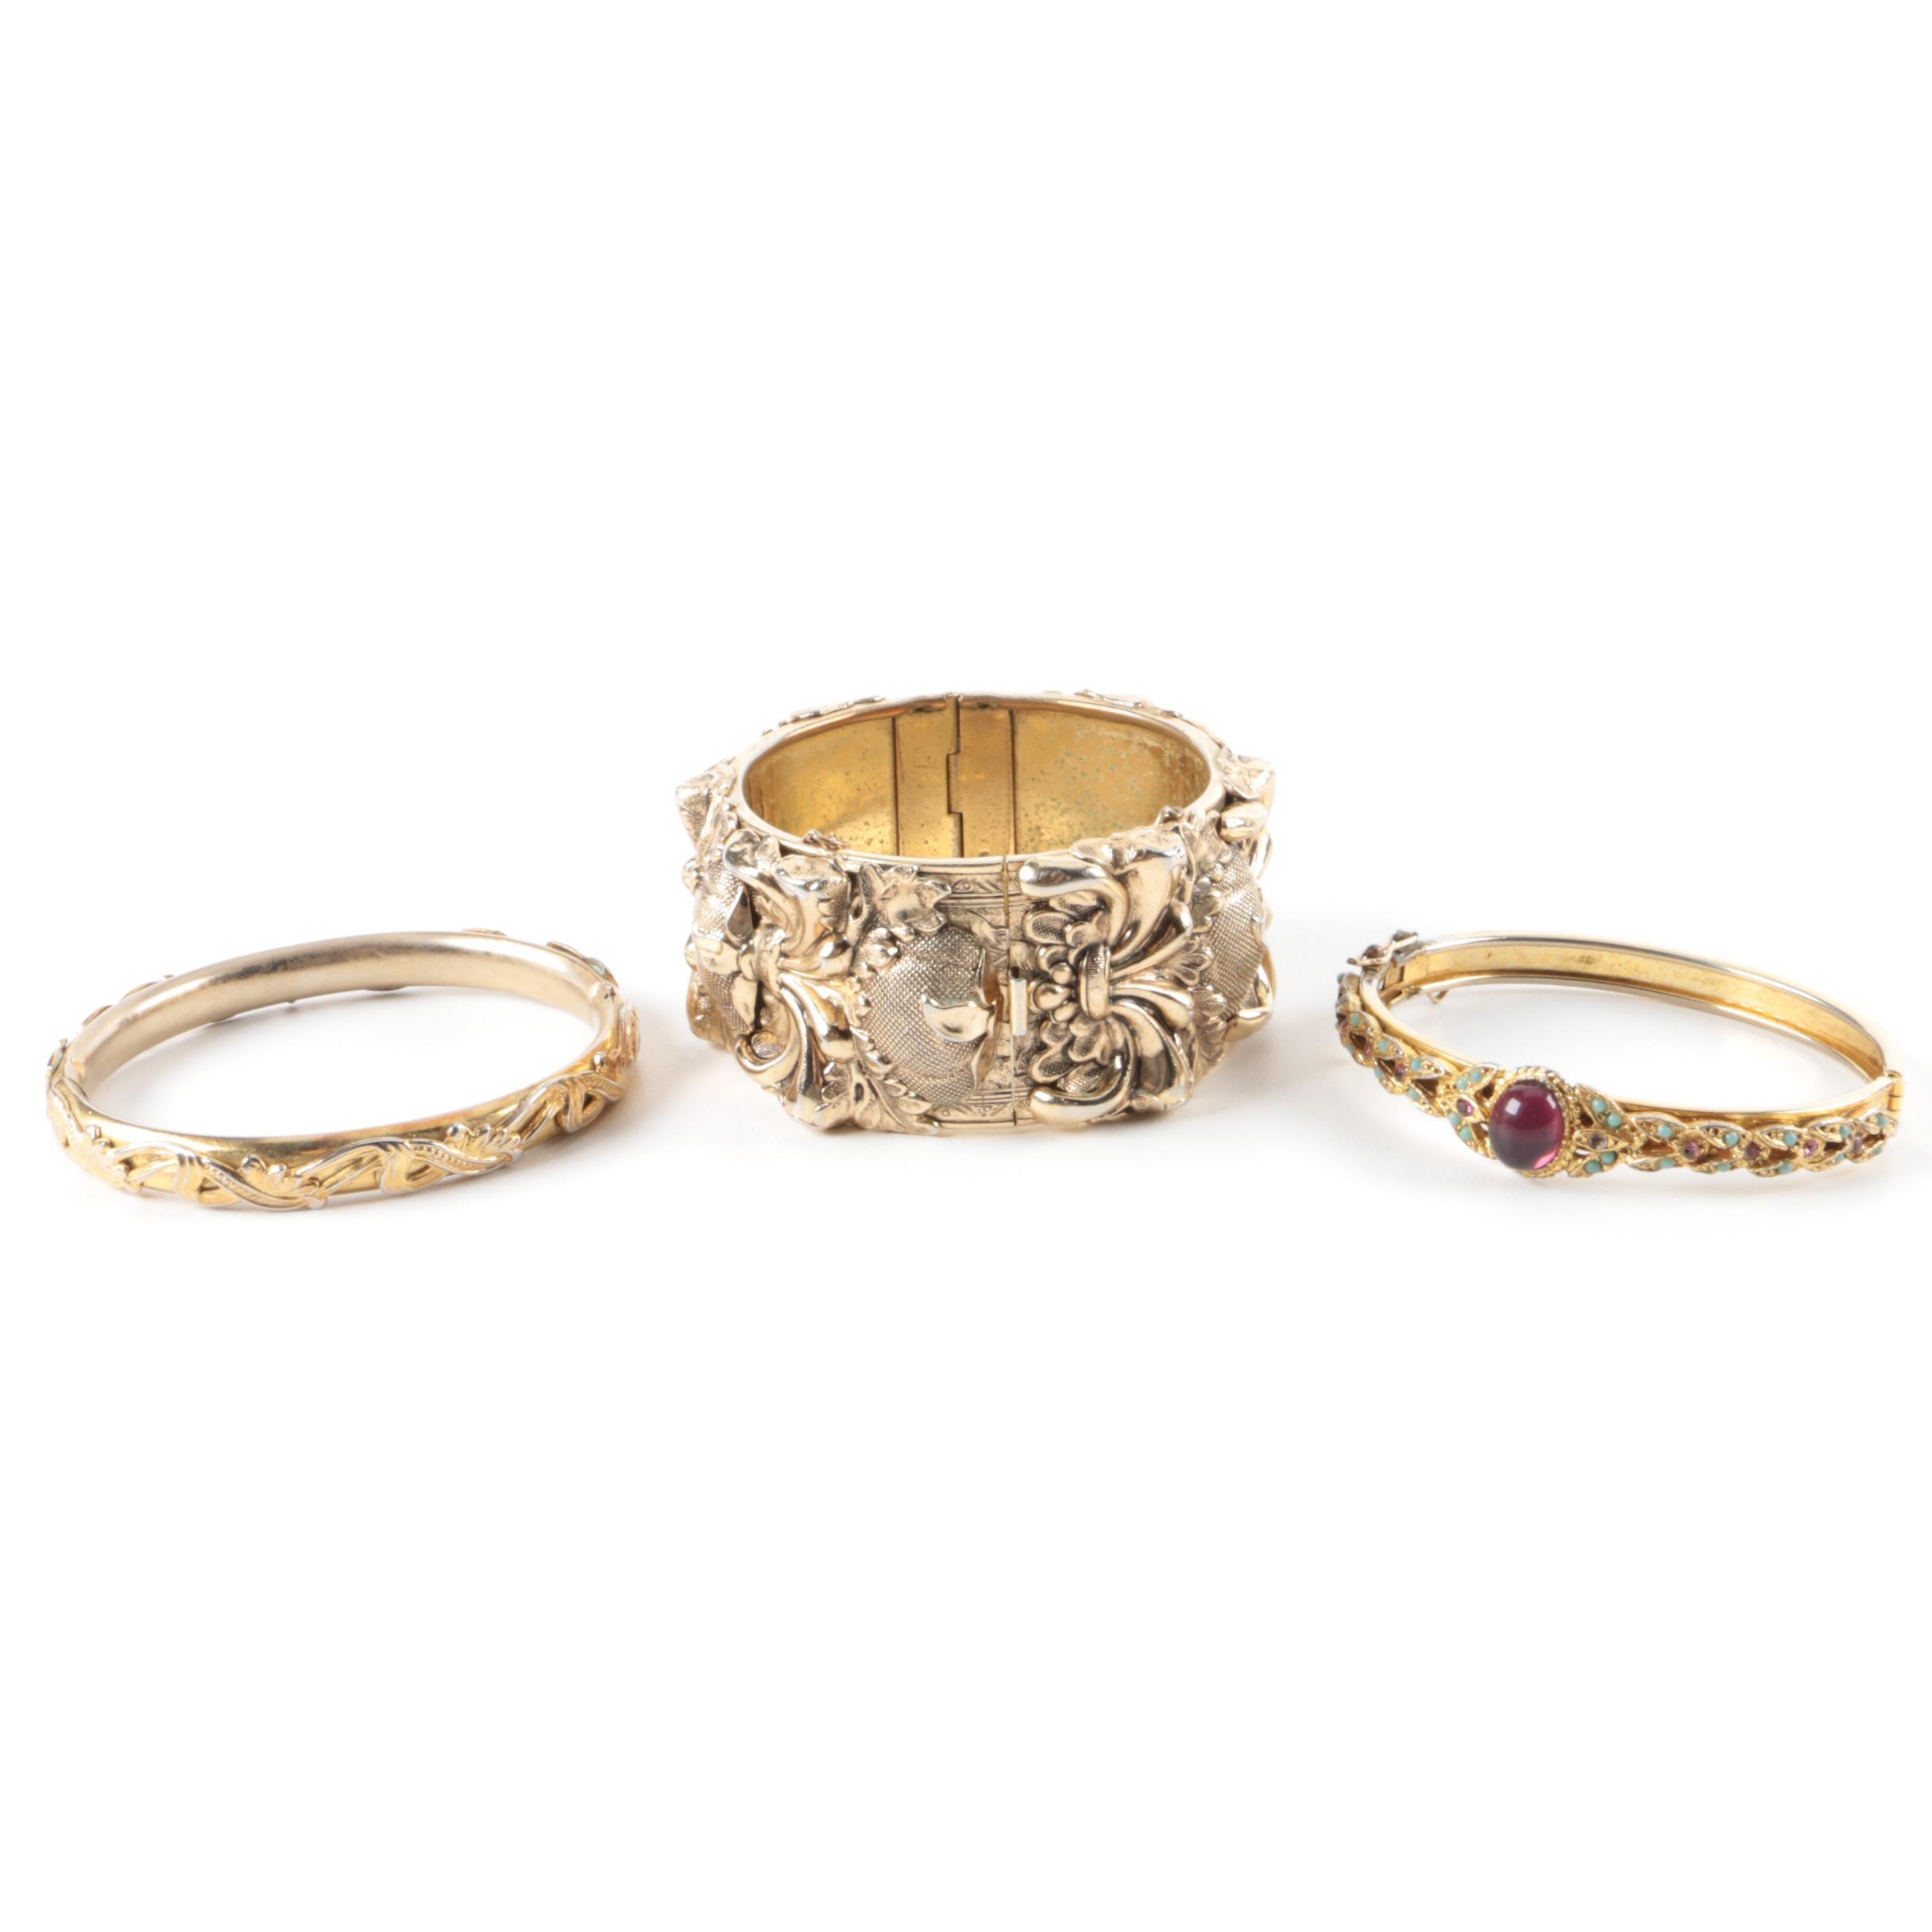 Vintage Gold Tone Bracelet Assortment